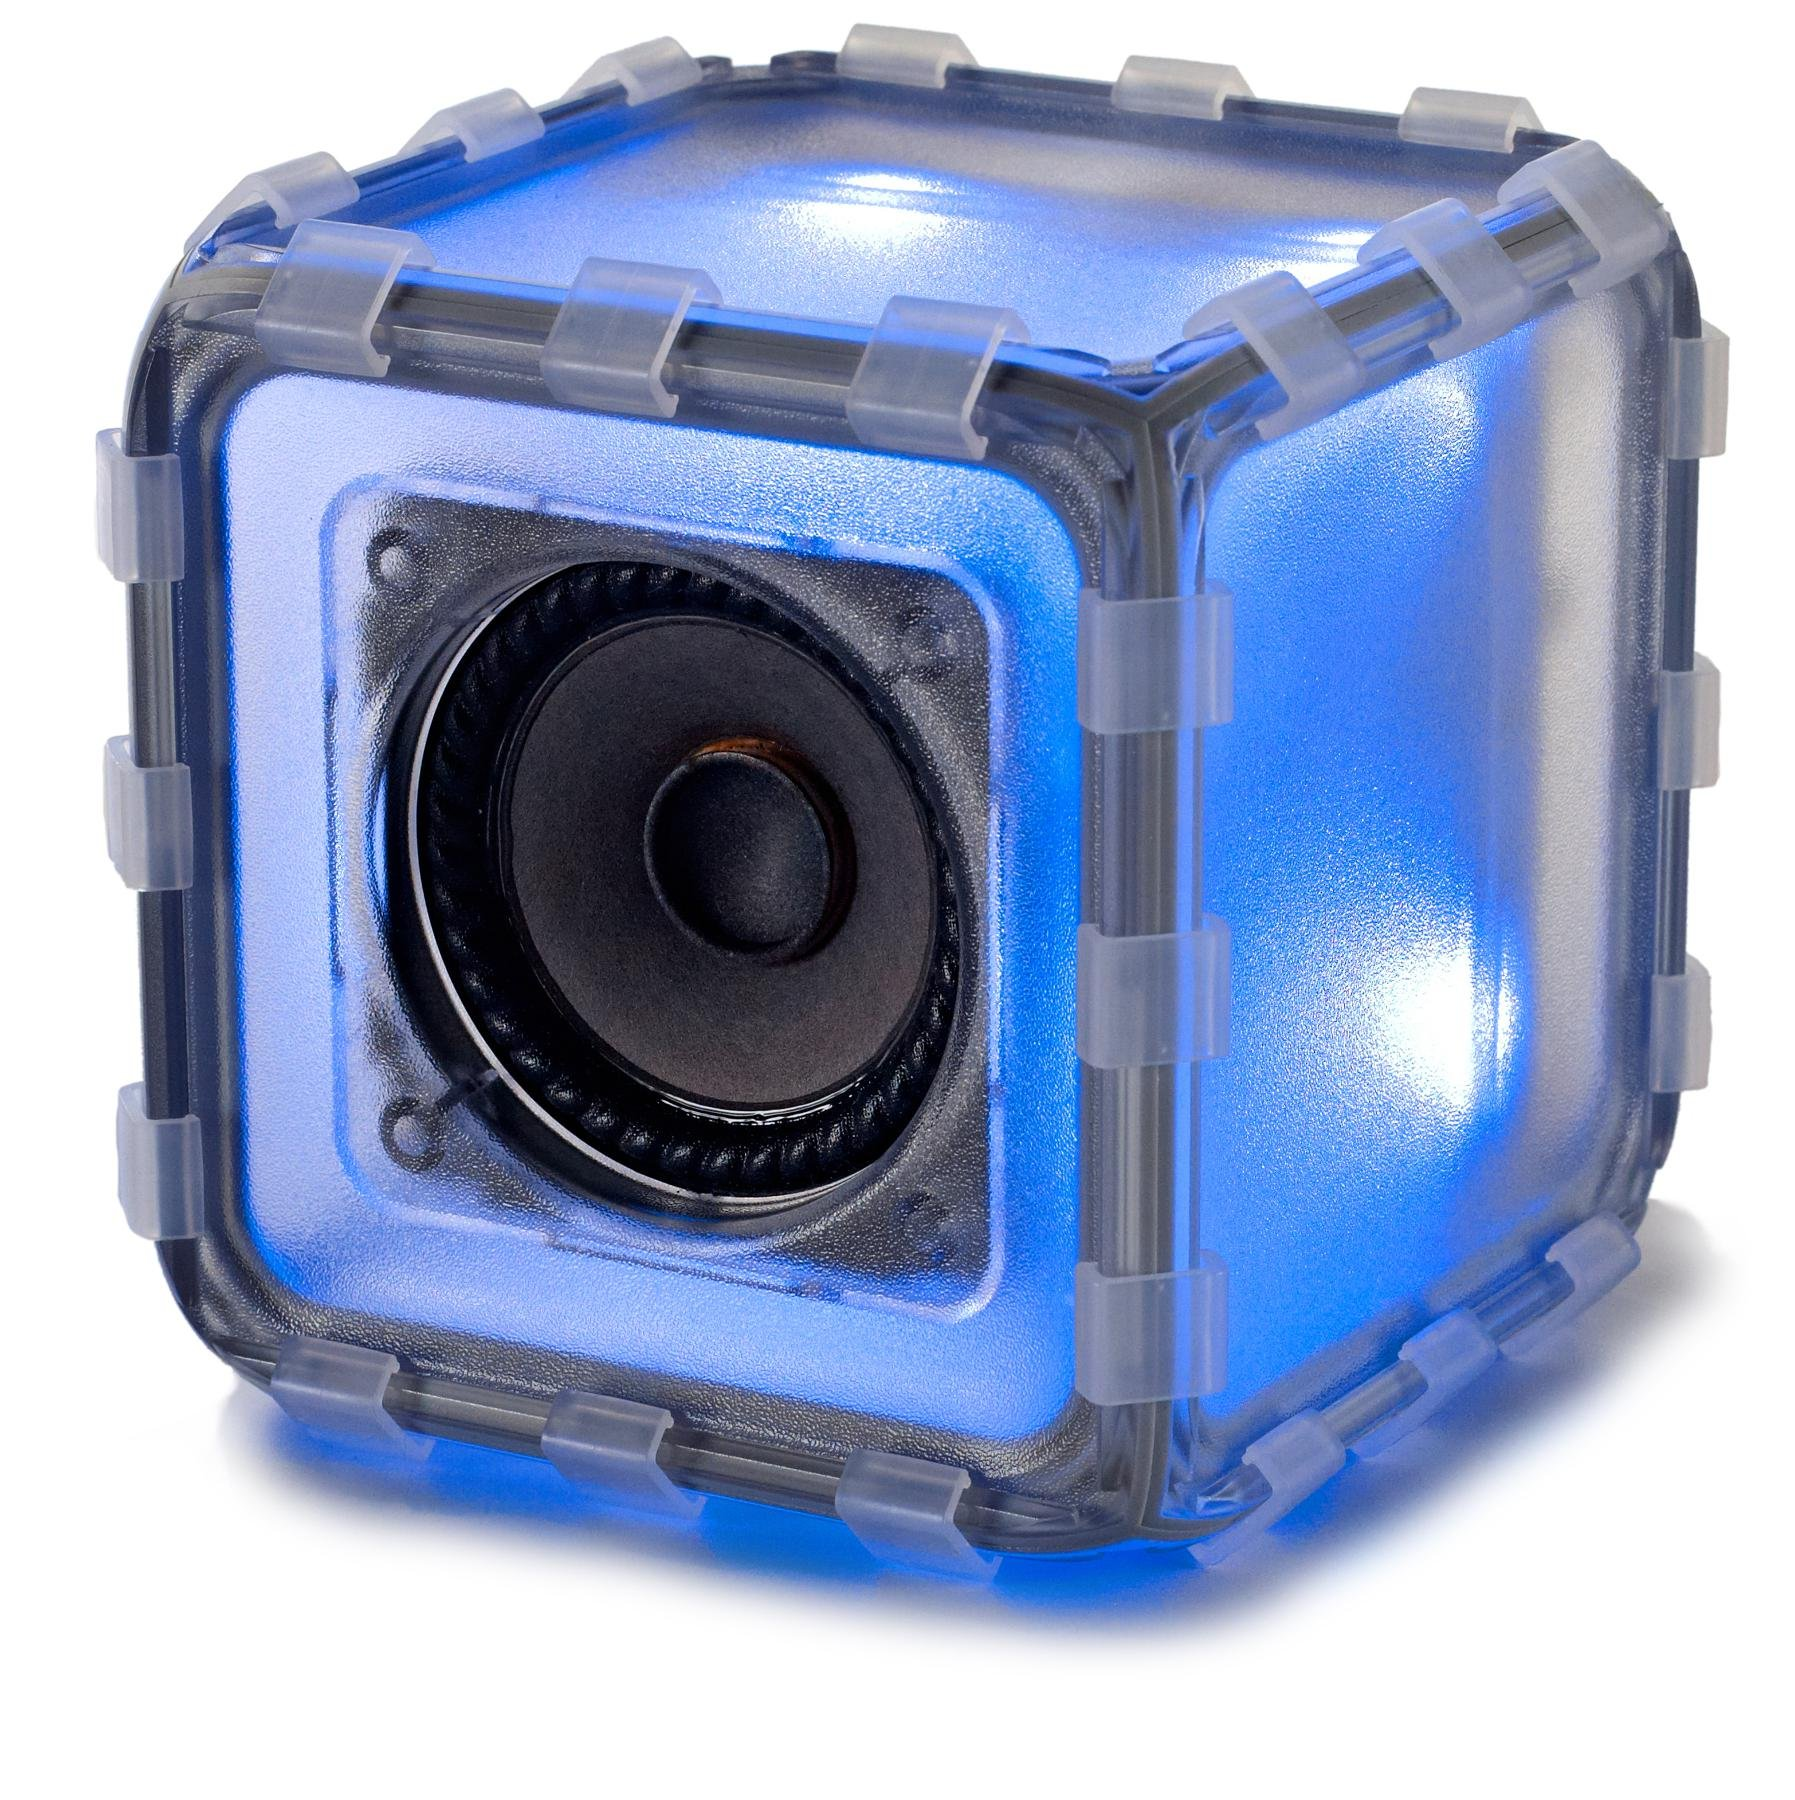 Bose Bosebuild Speaker Cube Sweetwater Snap Circuitsr Electromagnetism Storespacecom Image 1